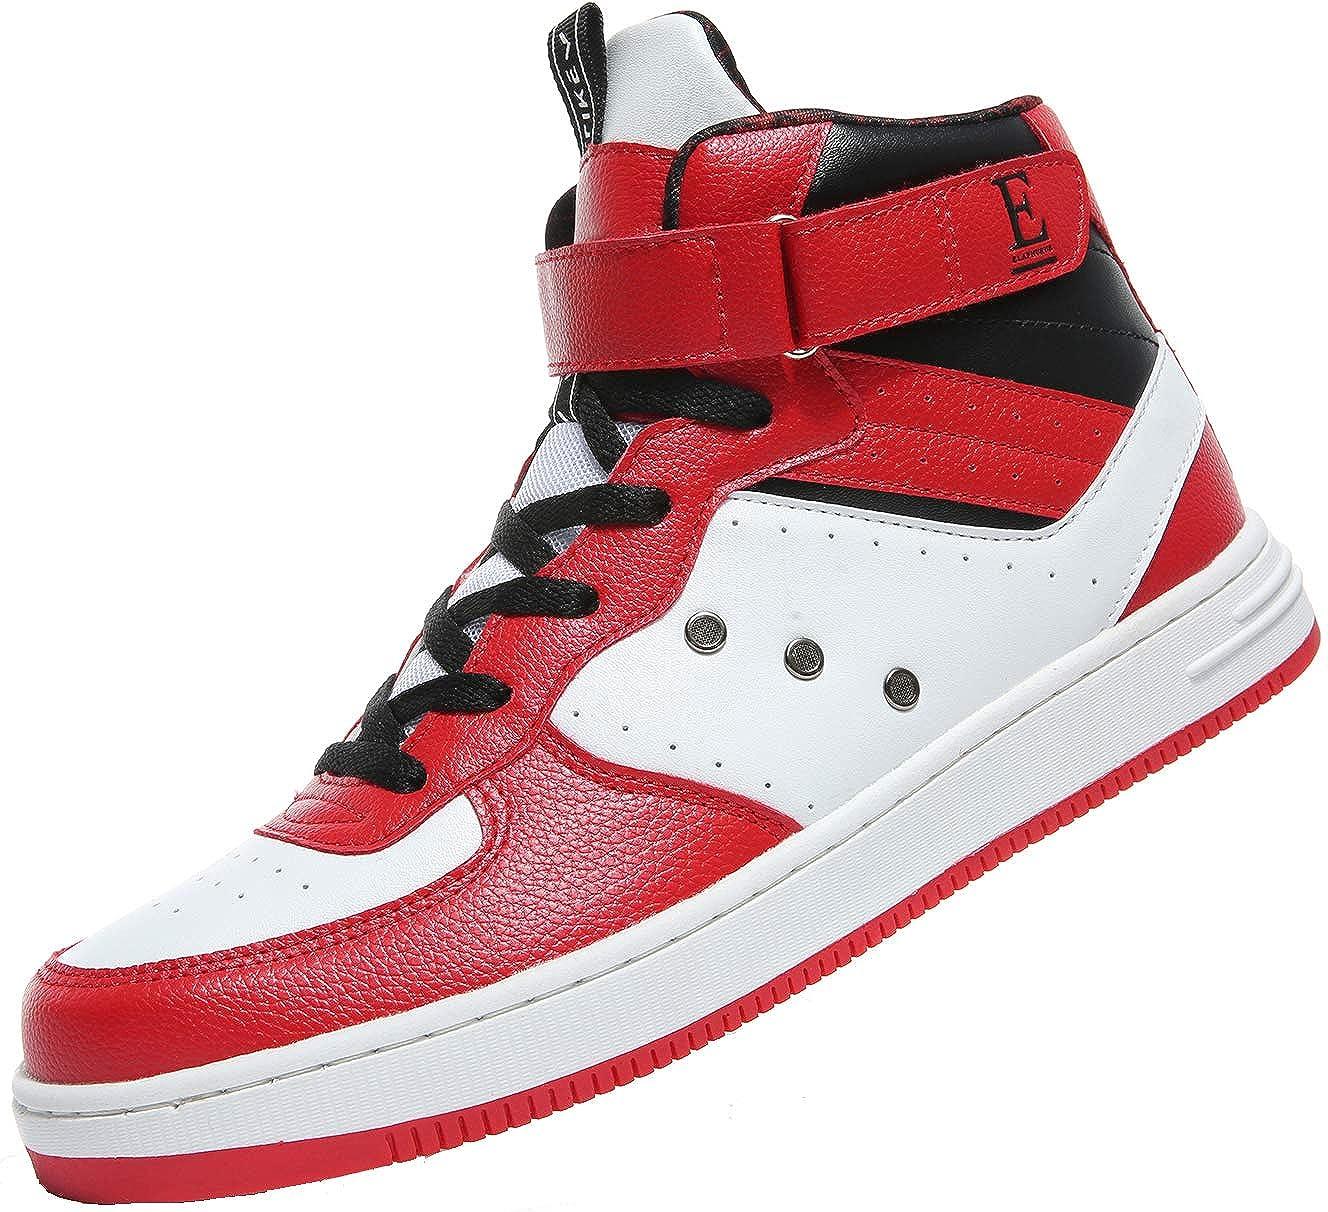 Chaussure de Skateboard Homme Basket Mode Chaussures de Sports Course Sneakers Fitness Gym athlétique Outdoor Casual